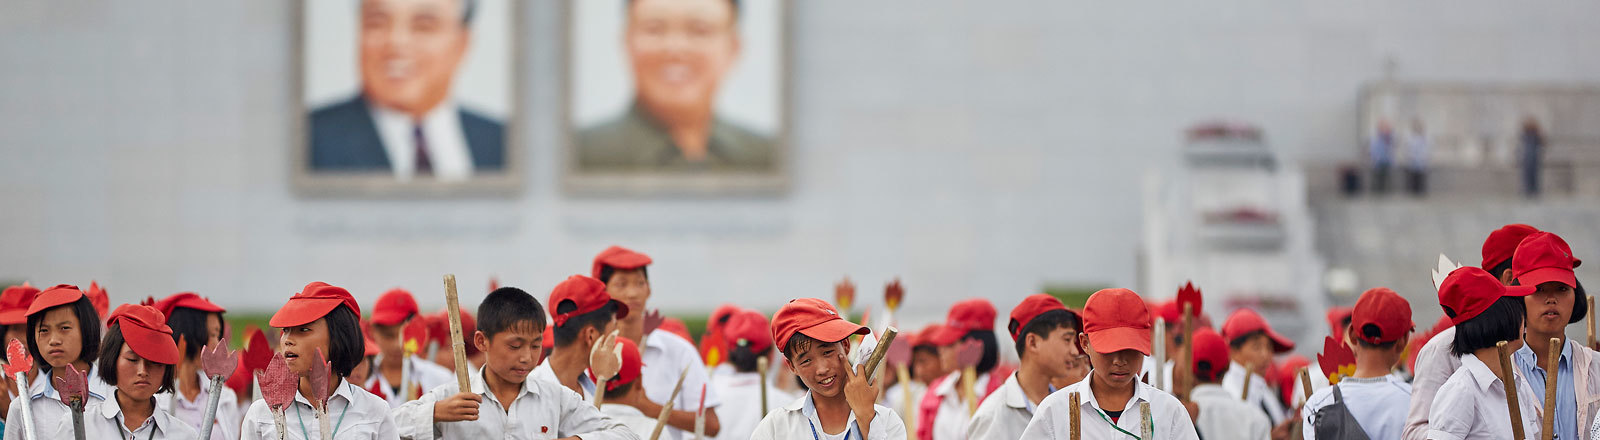 Parade in Pjöngjang, Nordkorea